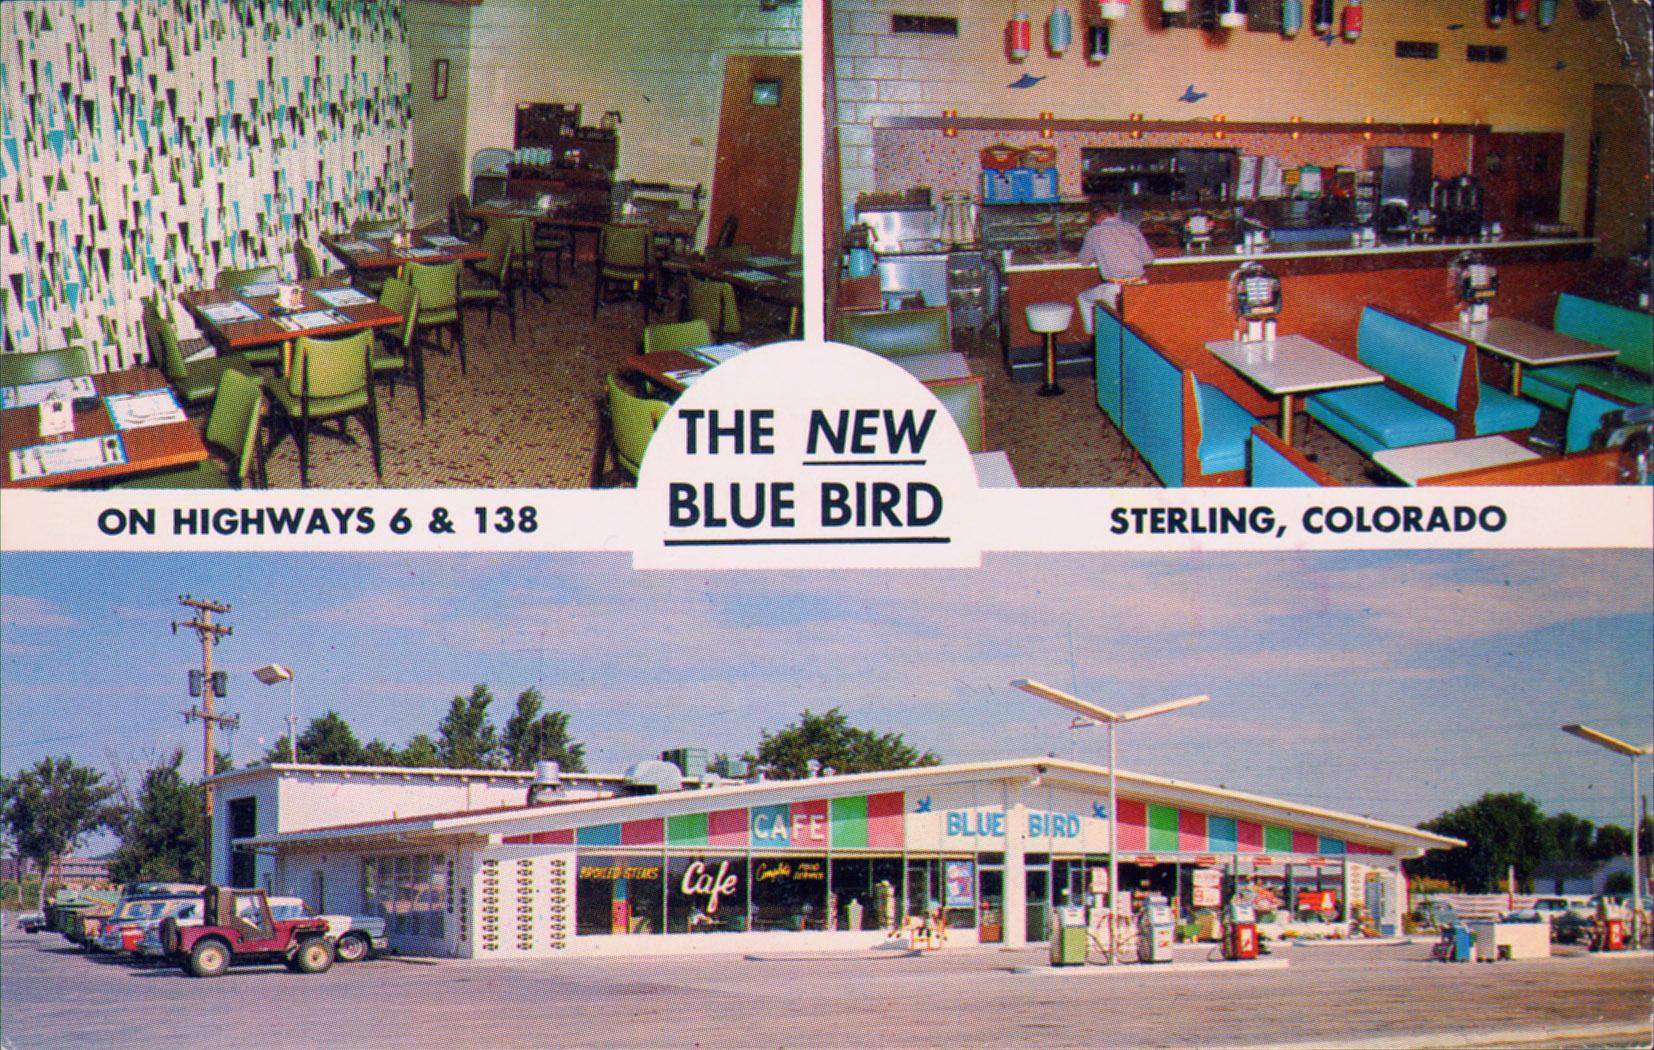 The Blue Bird Cafe postcard - 1602 South 6th Avenue, Sterling, Colorado U.S.A. - 1950s